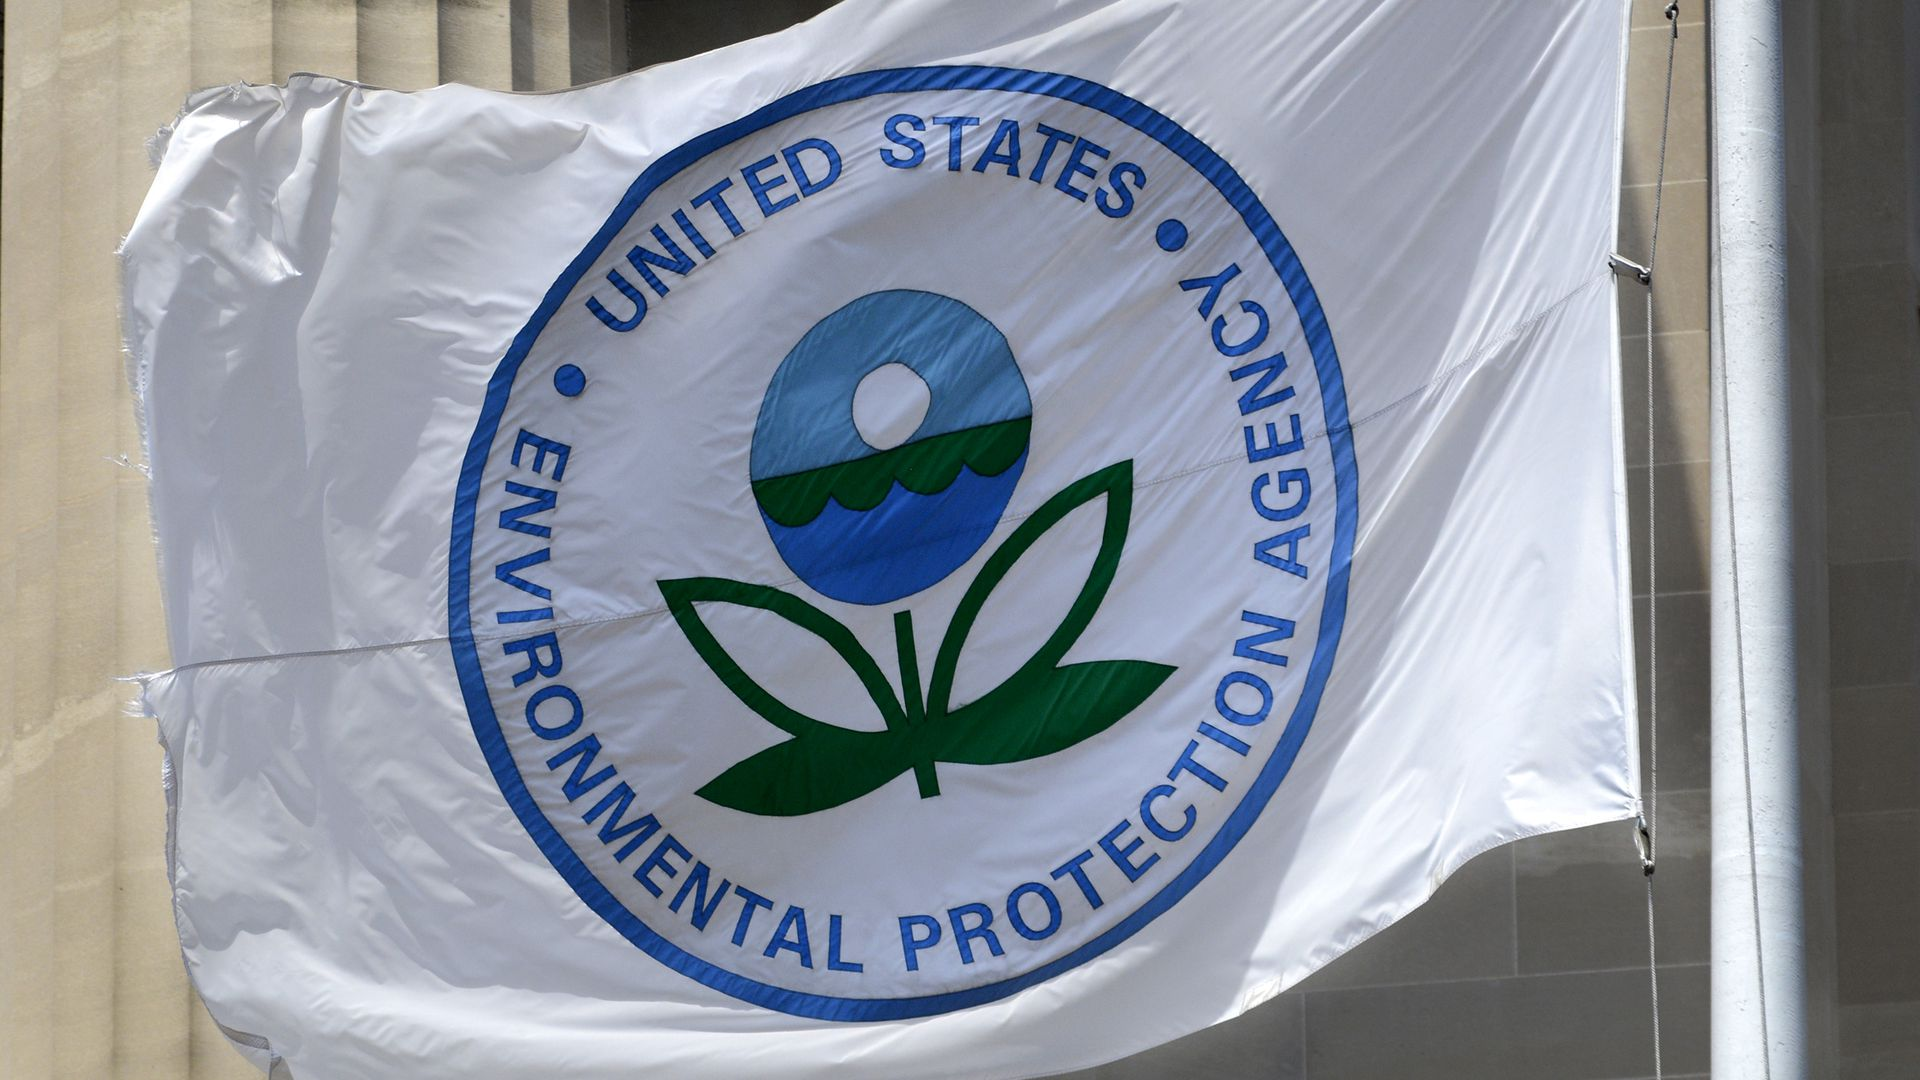 The EPA logo